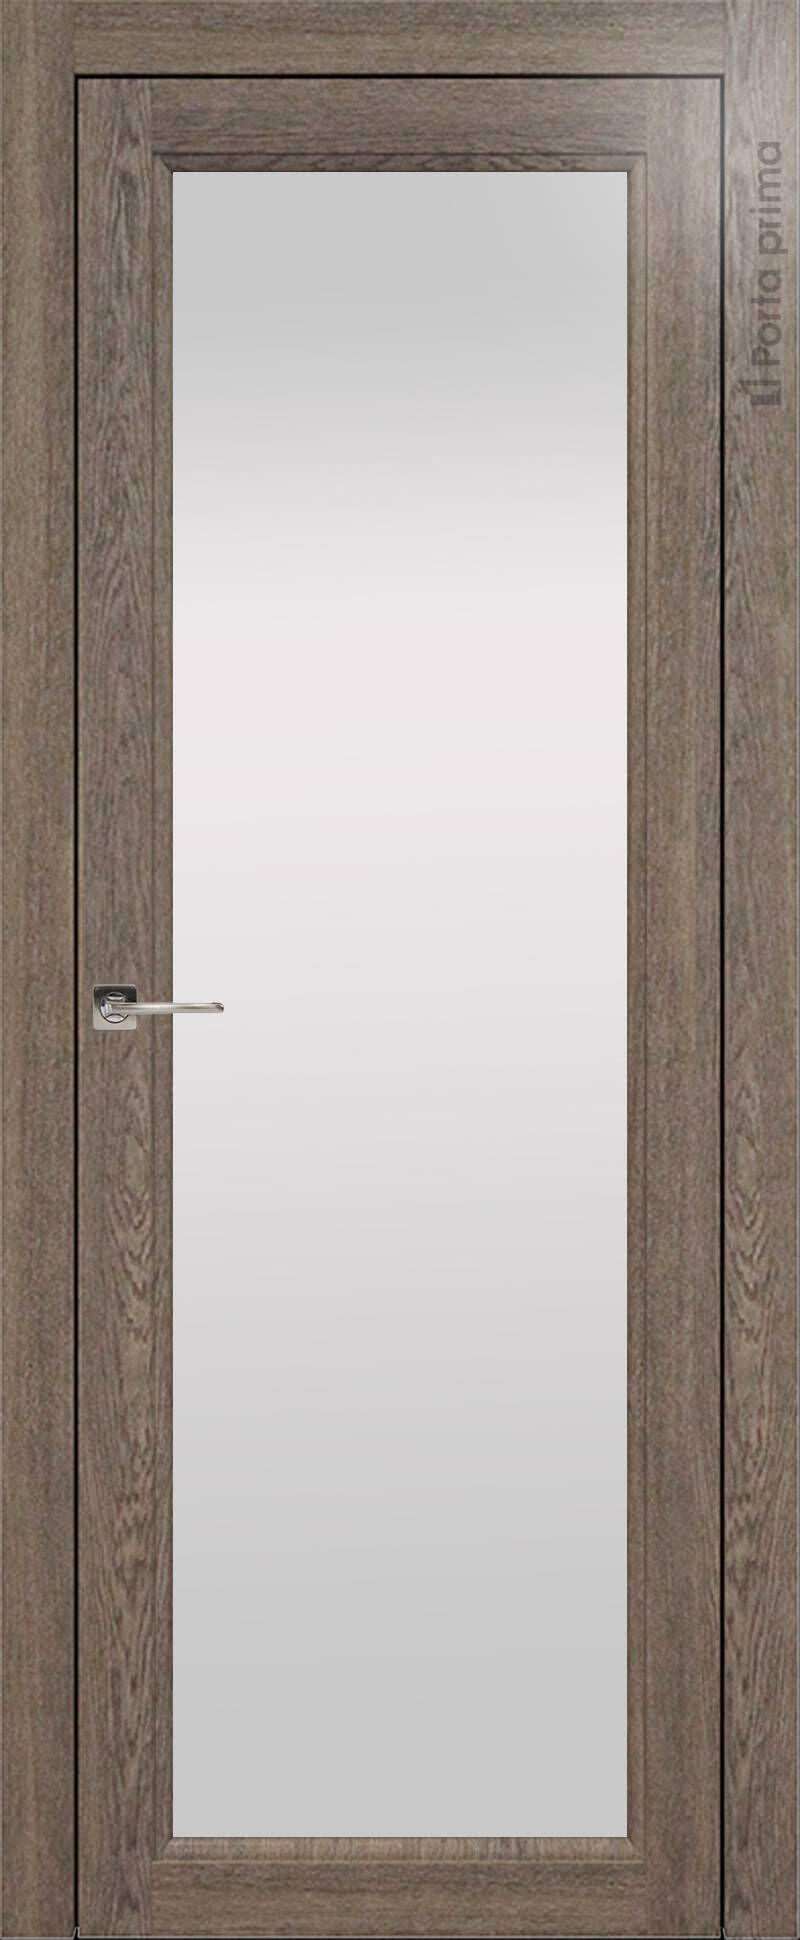 Sorrento-R Б4 цвет - Дуб антик Со стеклом (ДО)